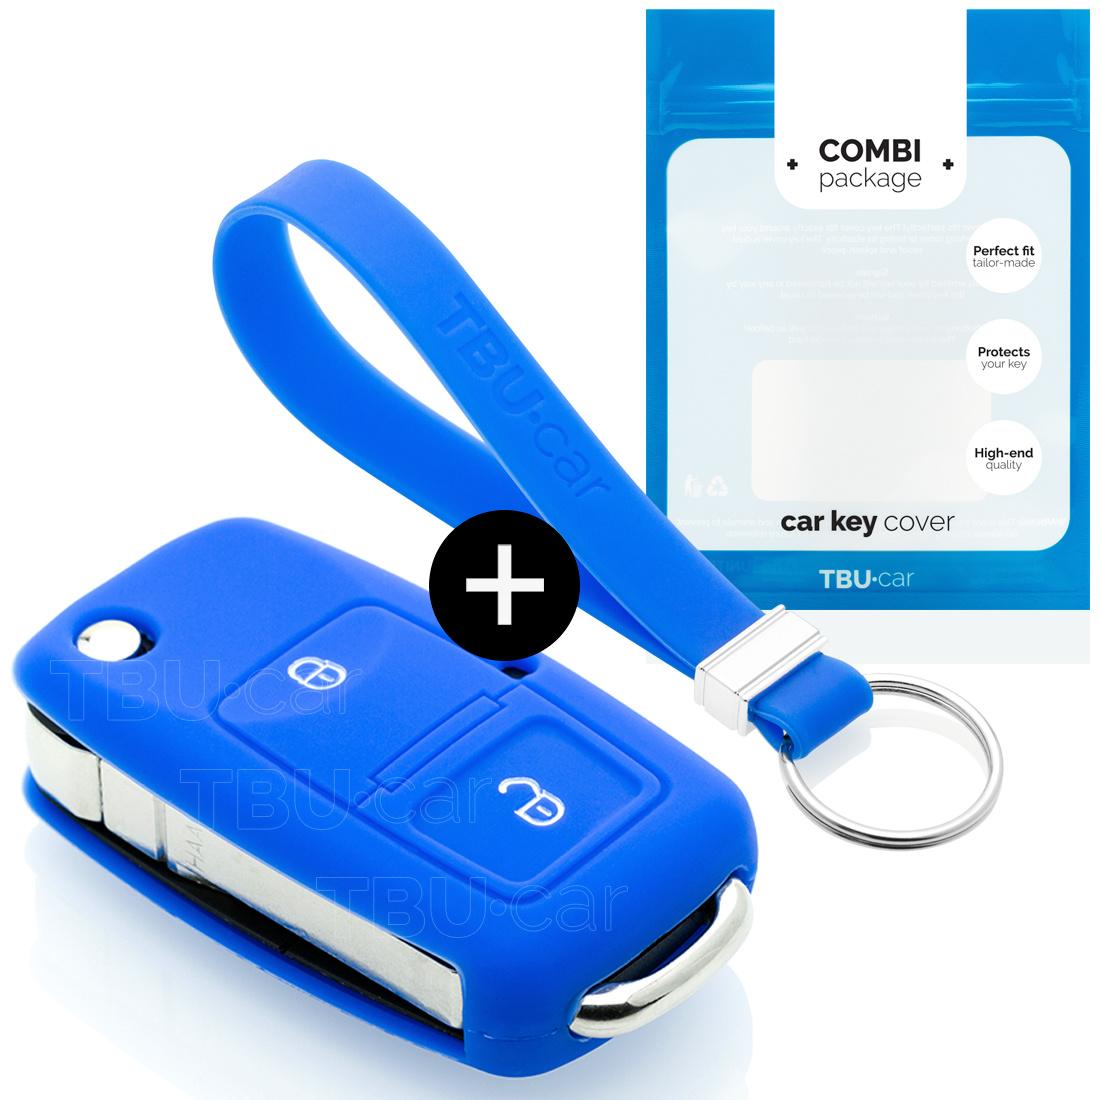 TBU car TBU car Autoschlüssel Hülle kompatibel mit Seat 2 Tasten - Schutzhülle aus Silikon - Auto Schlüsselhülle Cover in Blau